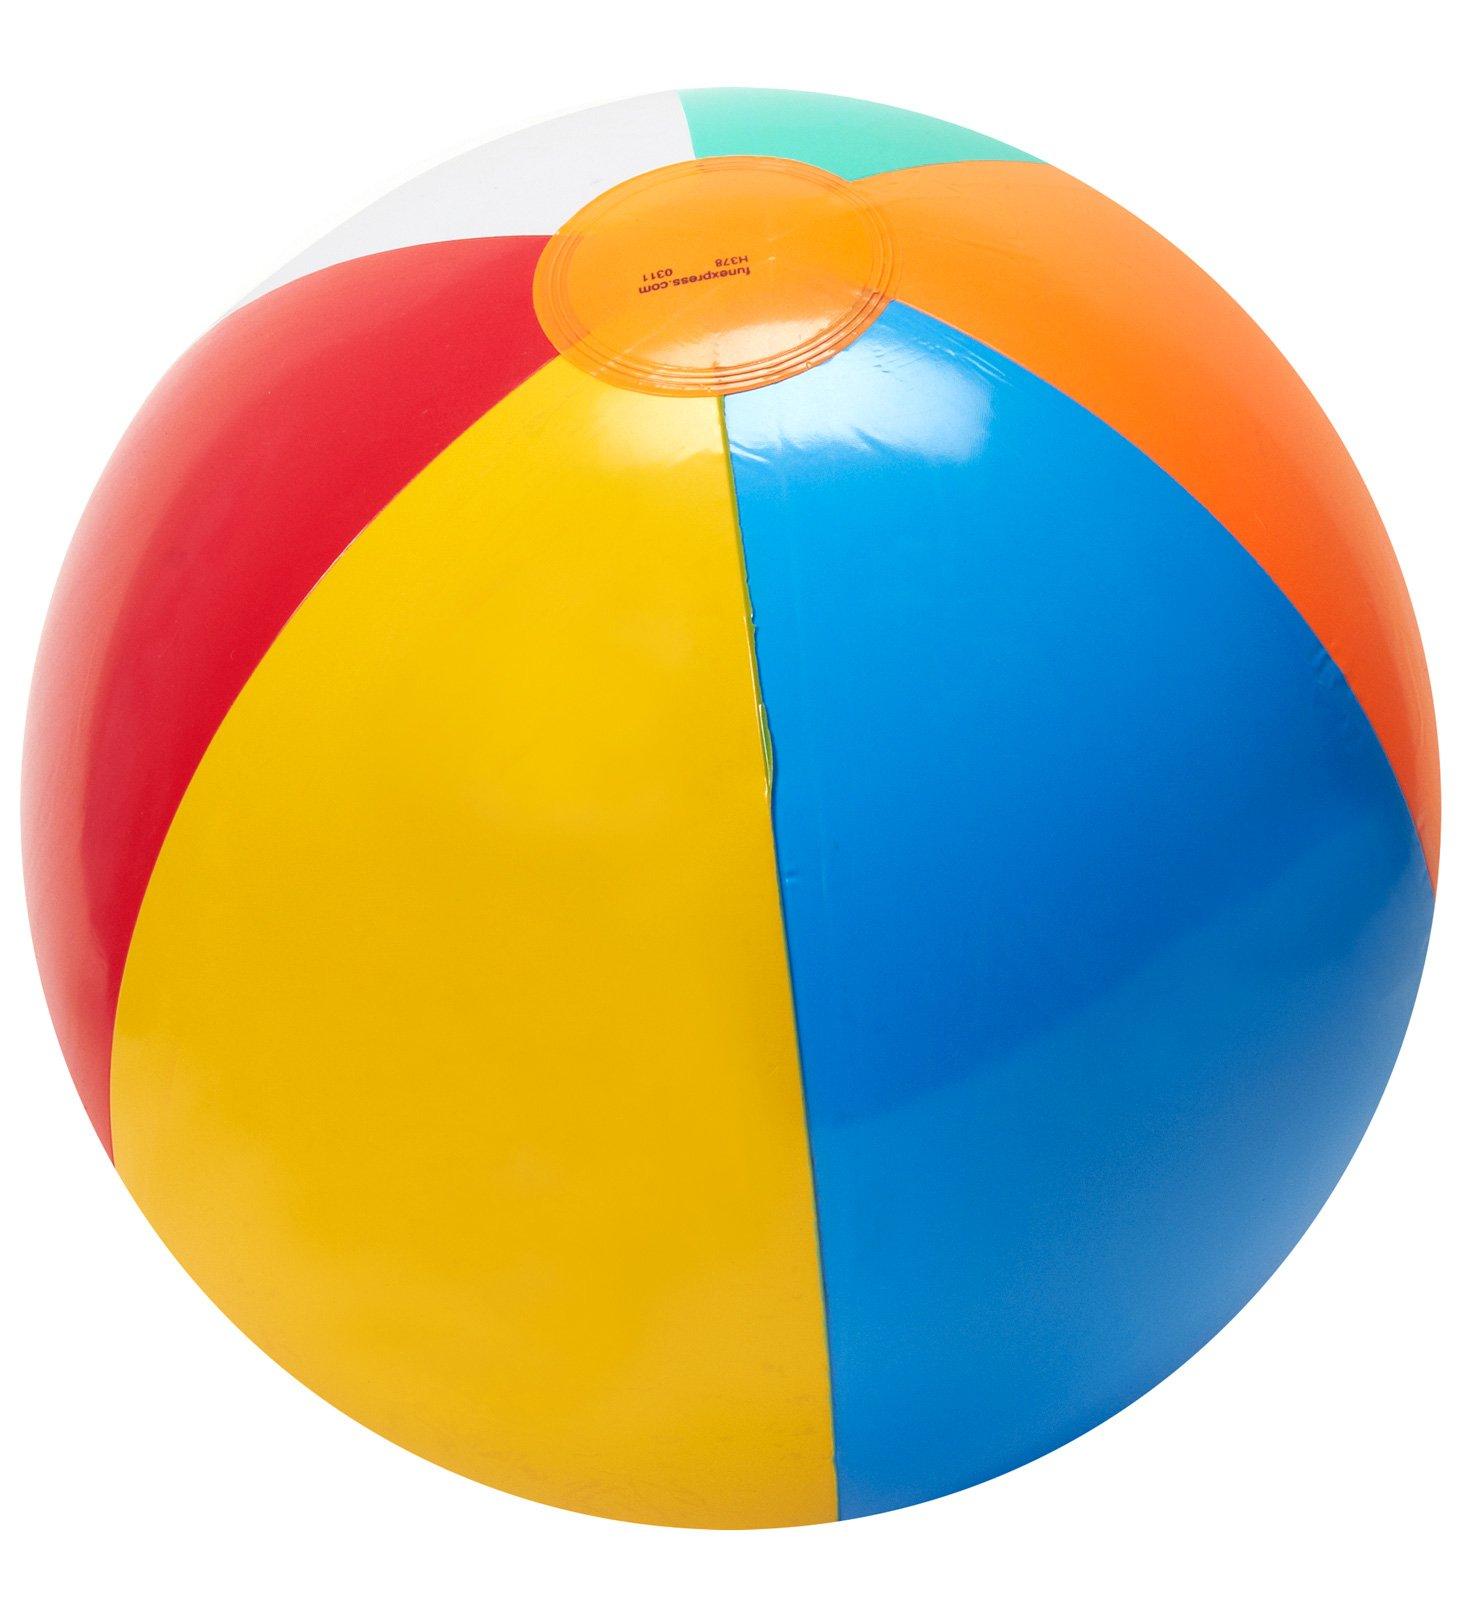 hight resolution of beach ball clip art image 18169